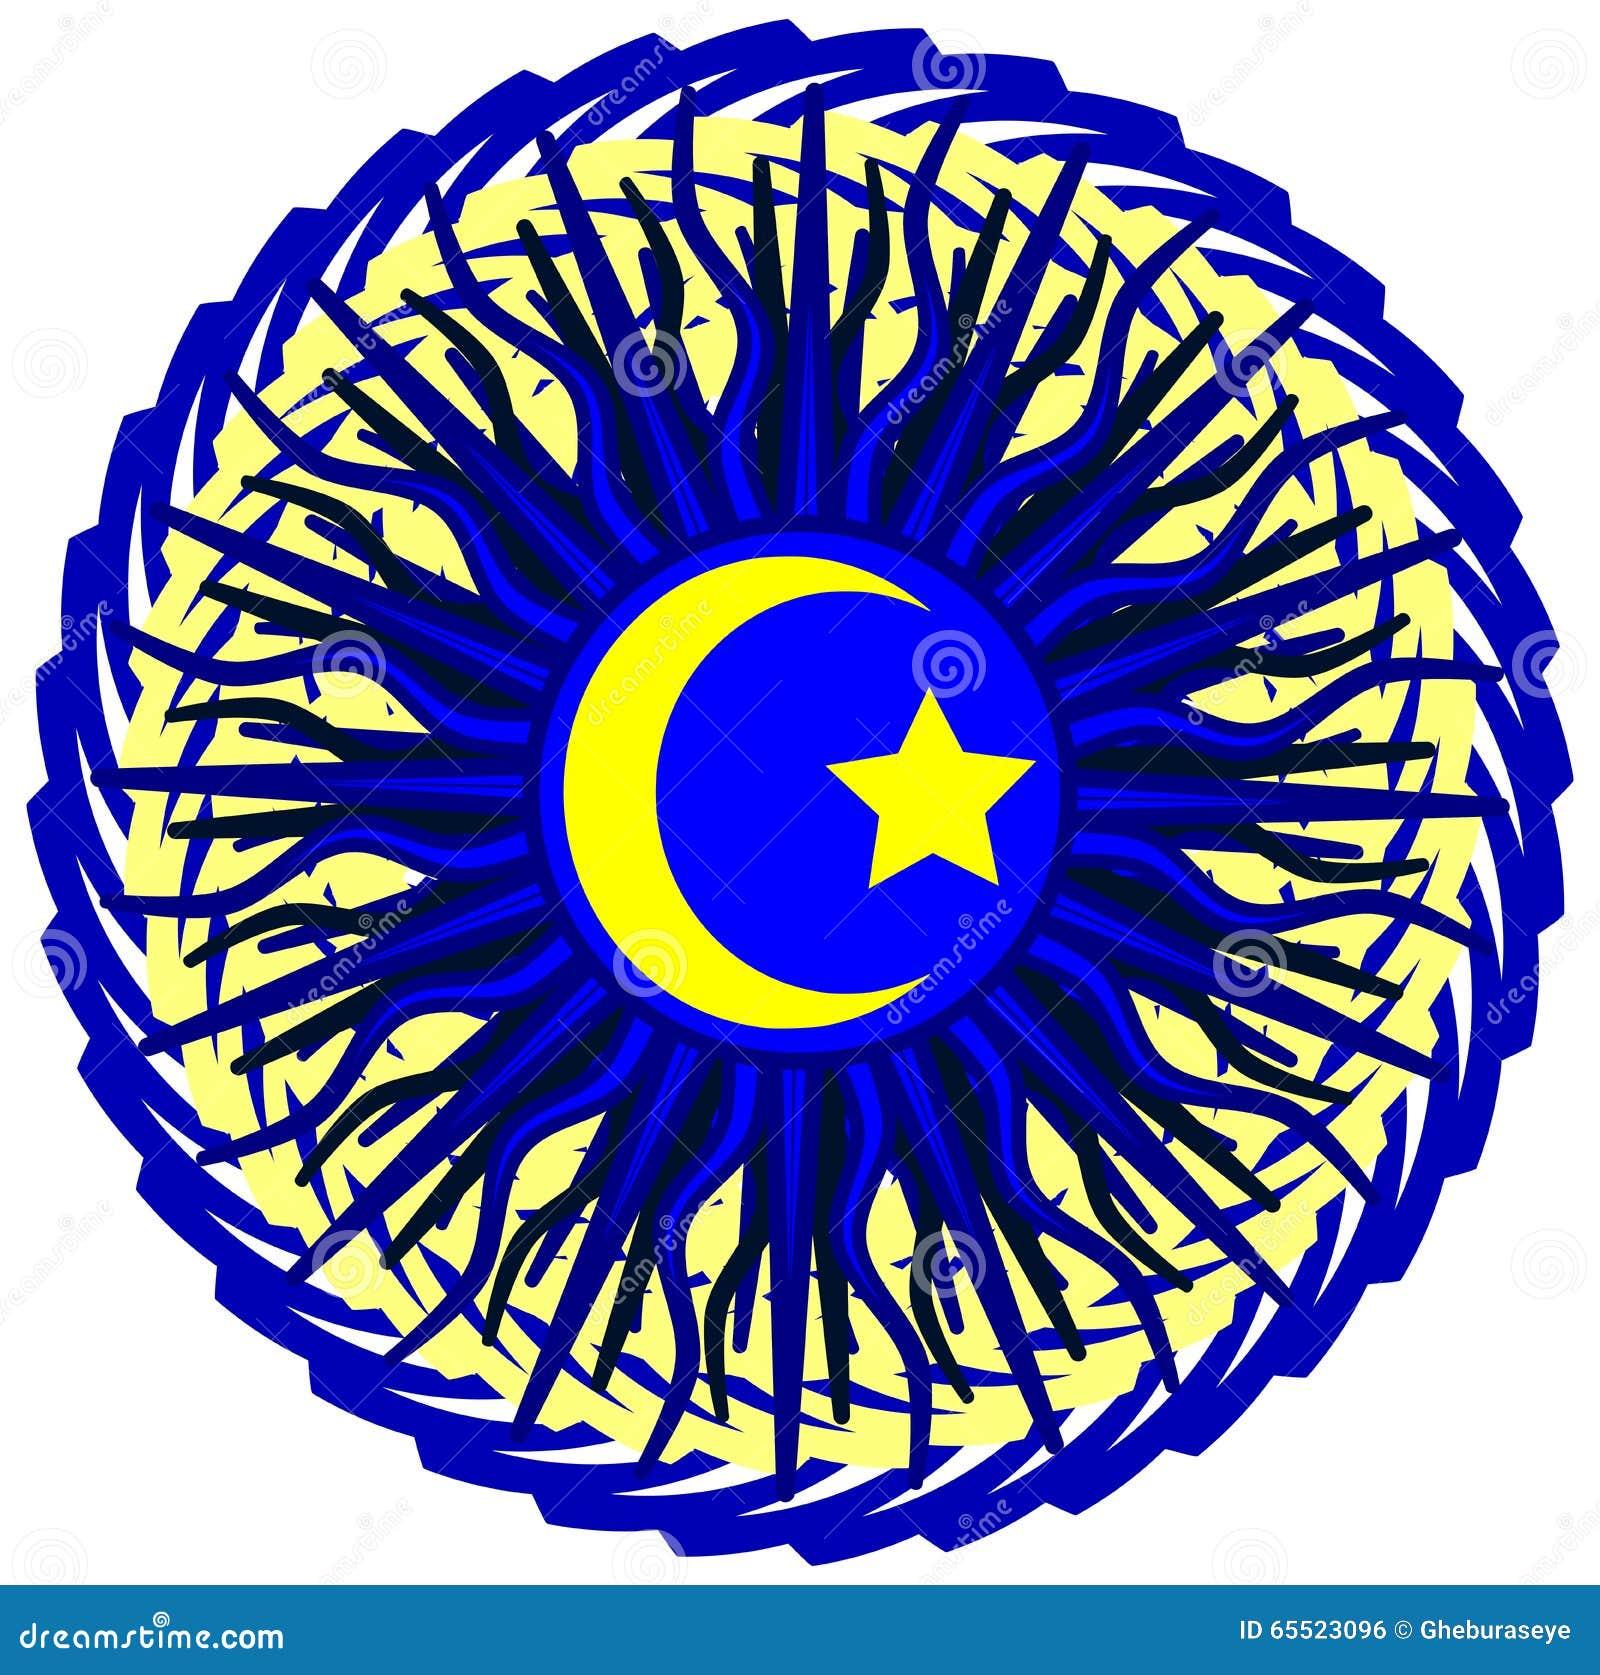 Islam Symbol On An Artistic Blue Decoration Stock Vector